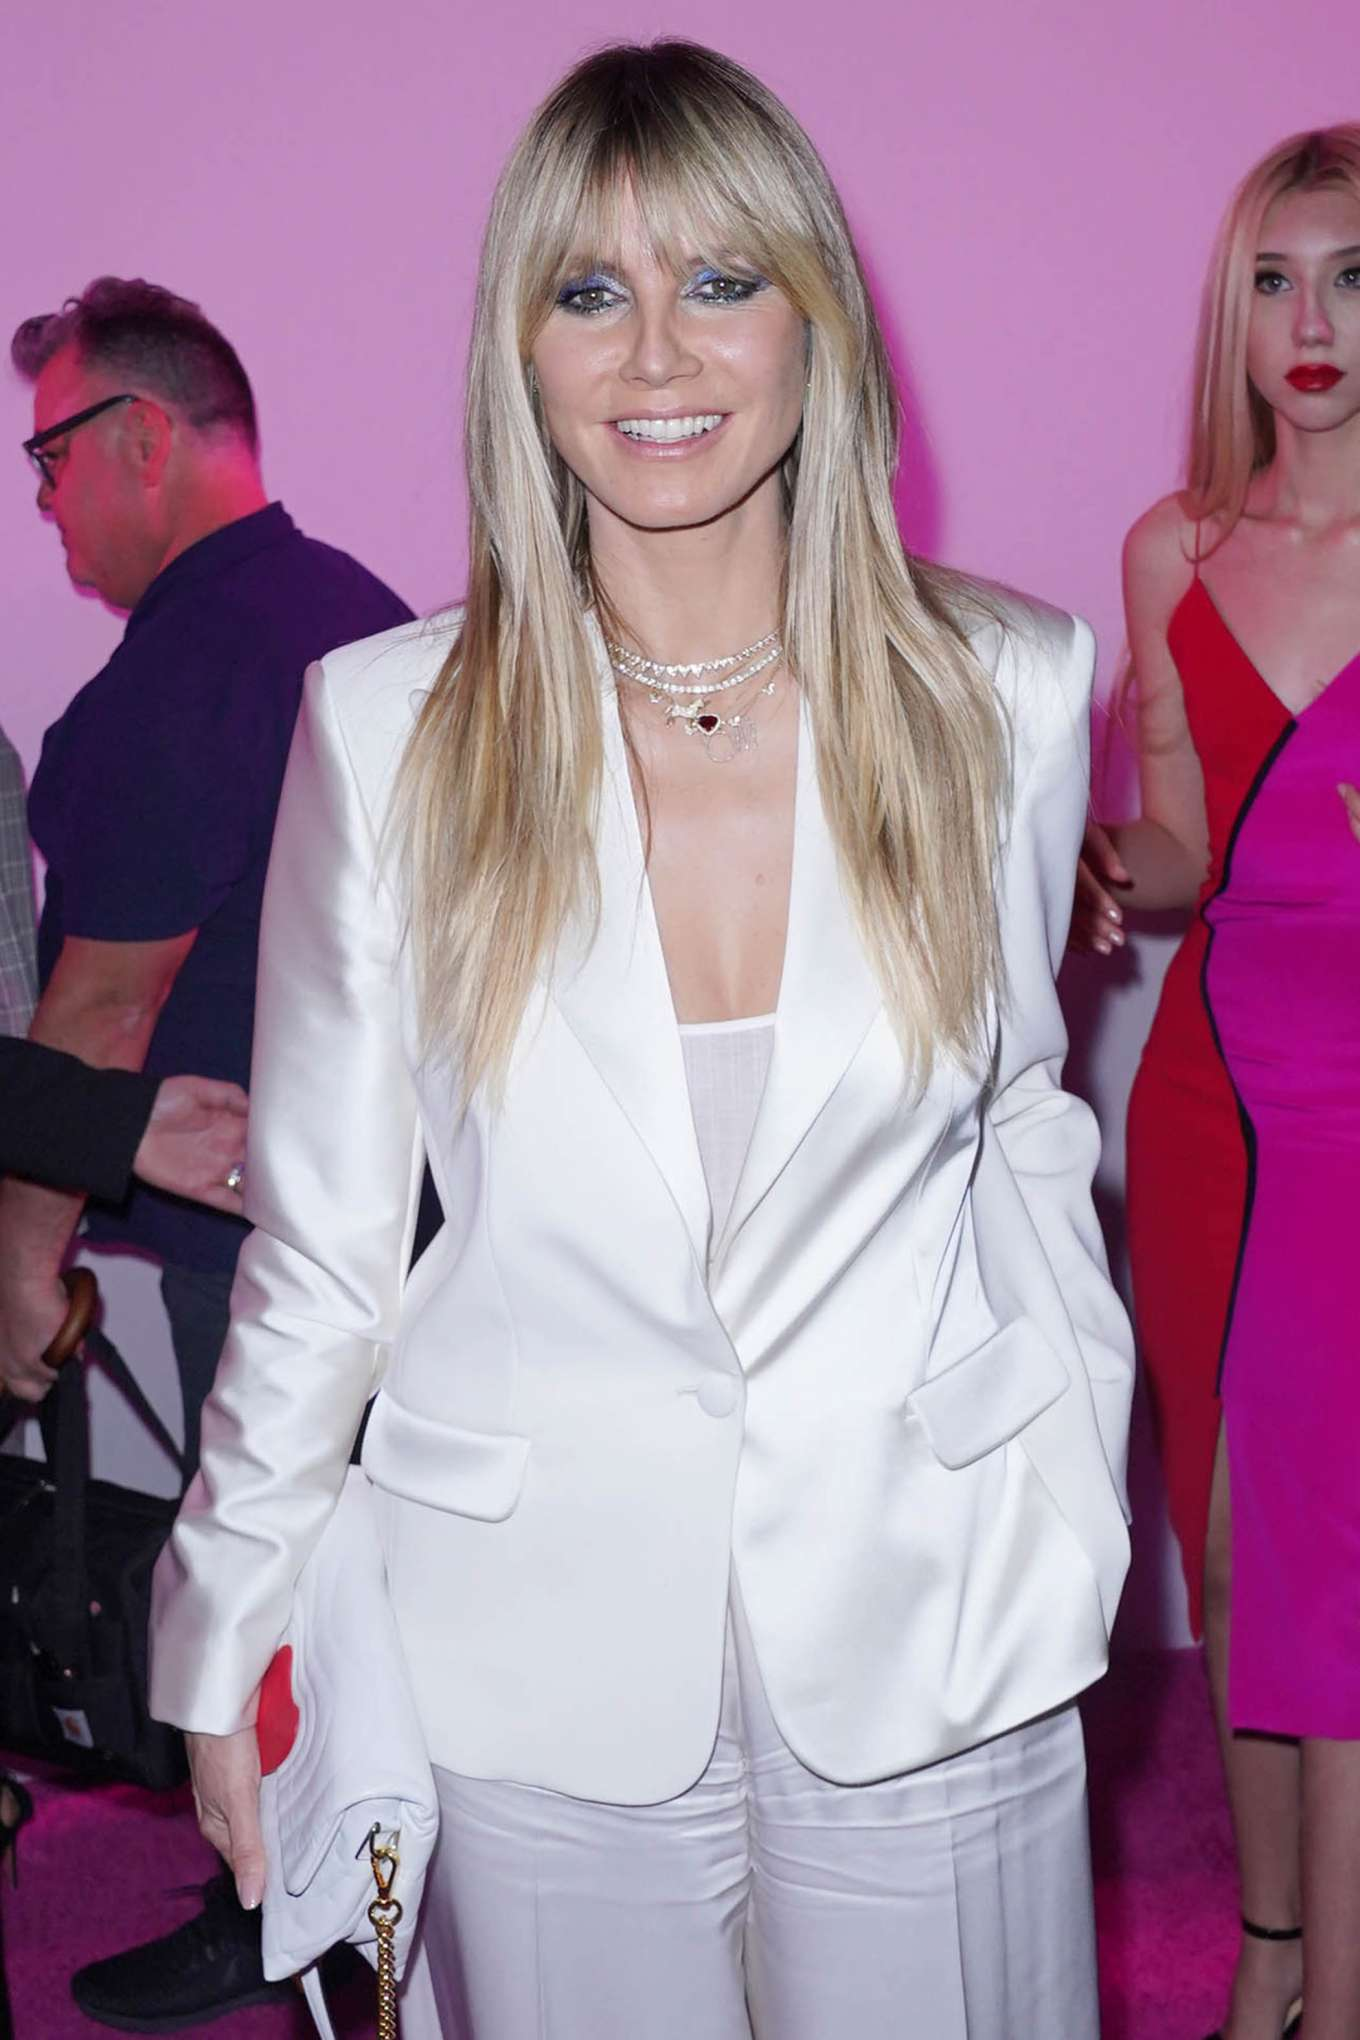 Heidi Klum - Christian Siriano Show at New York Fashion Week 2020